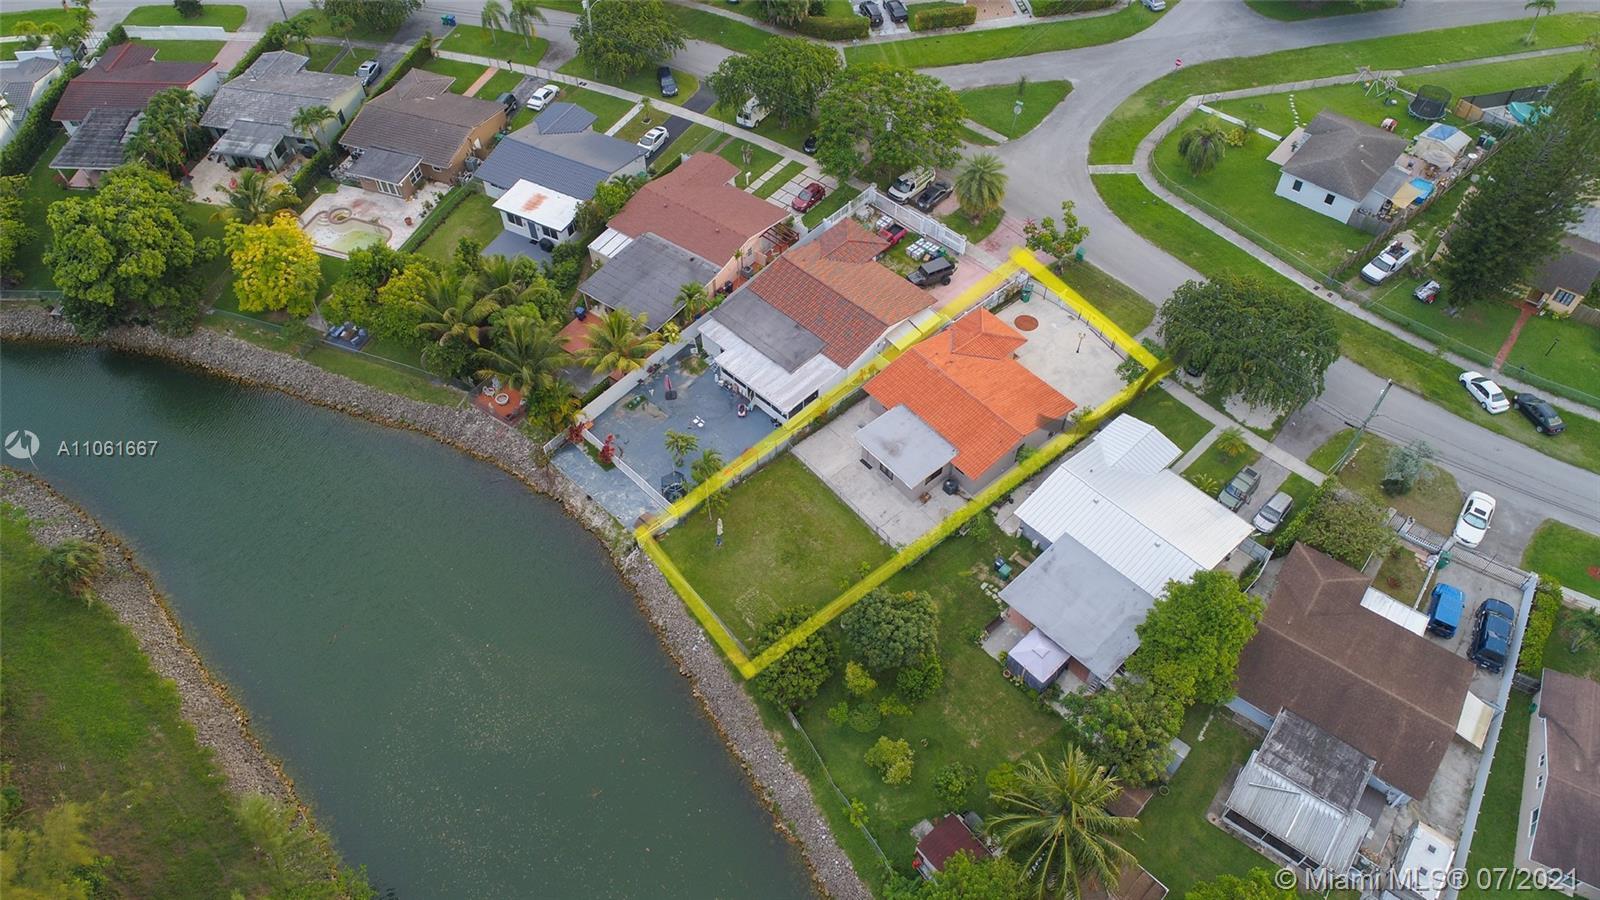 7433 S Waterway Dr photo08